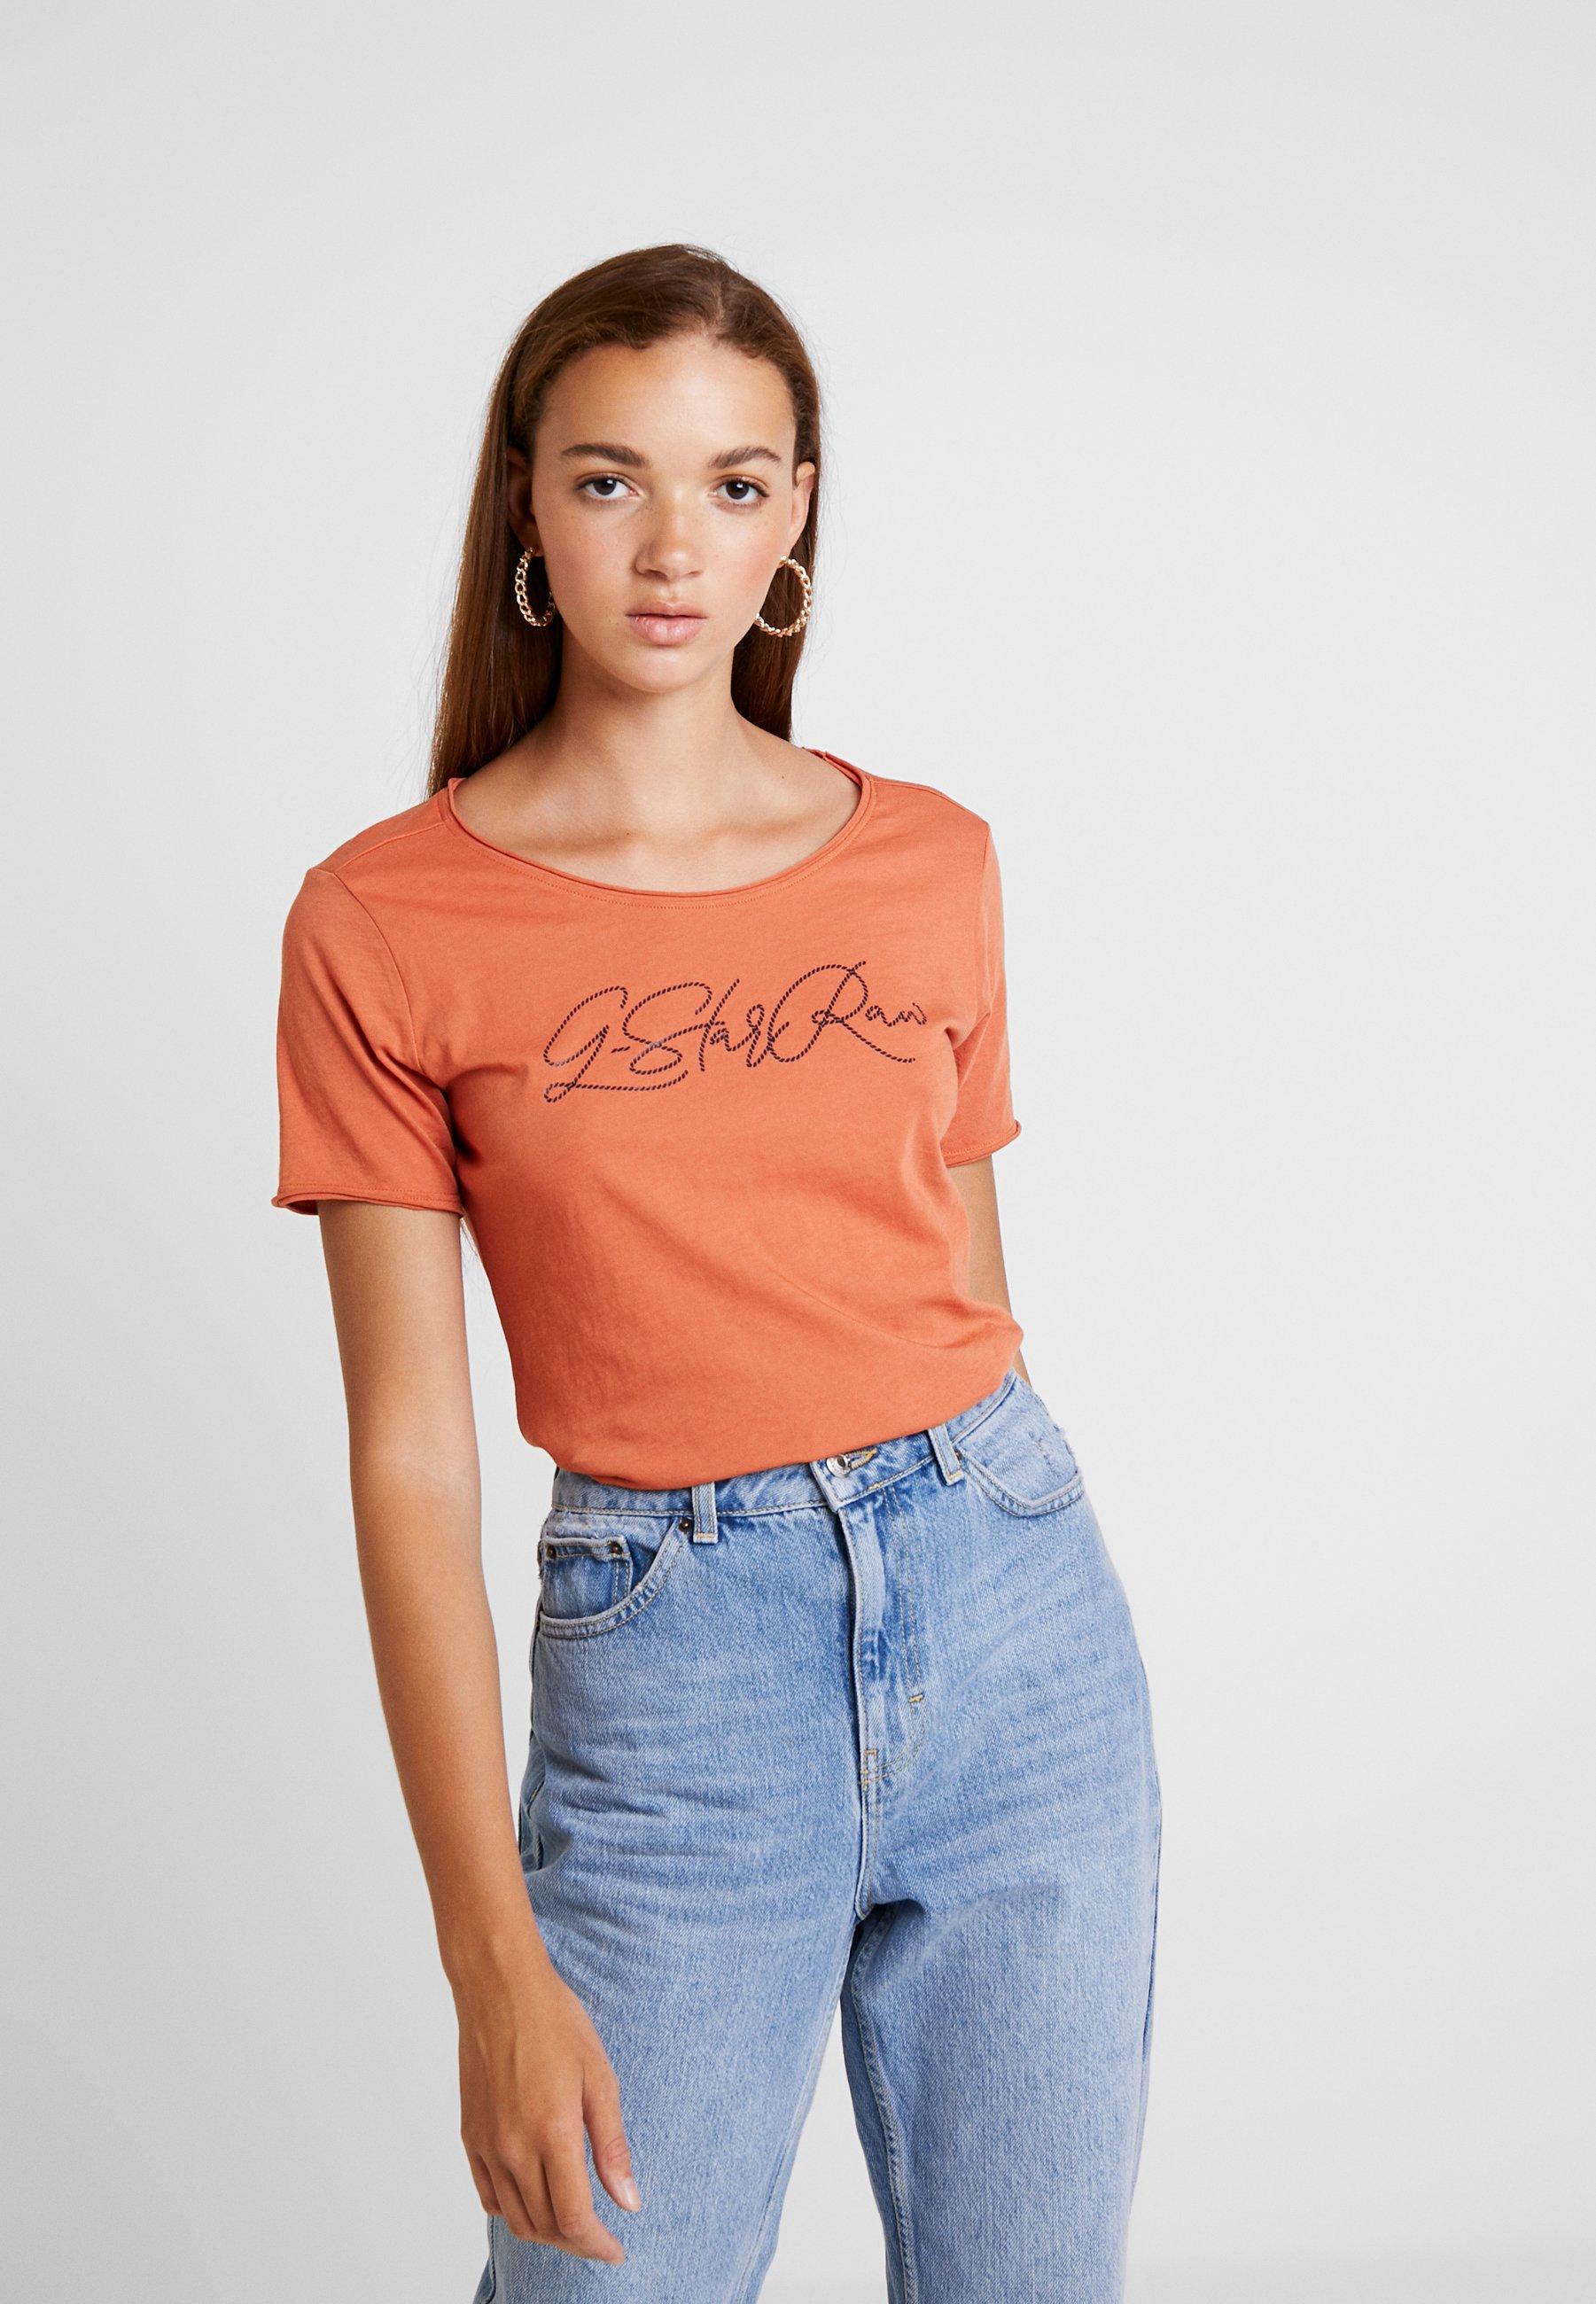 SlimT shirt Royal Optic Orange Imprimé G Dusty star Graphic 08wknOP